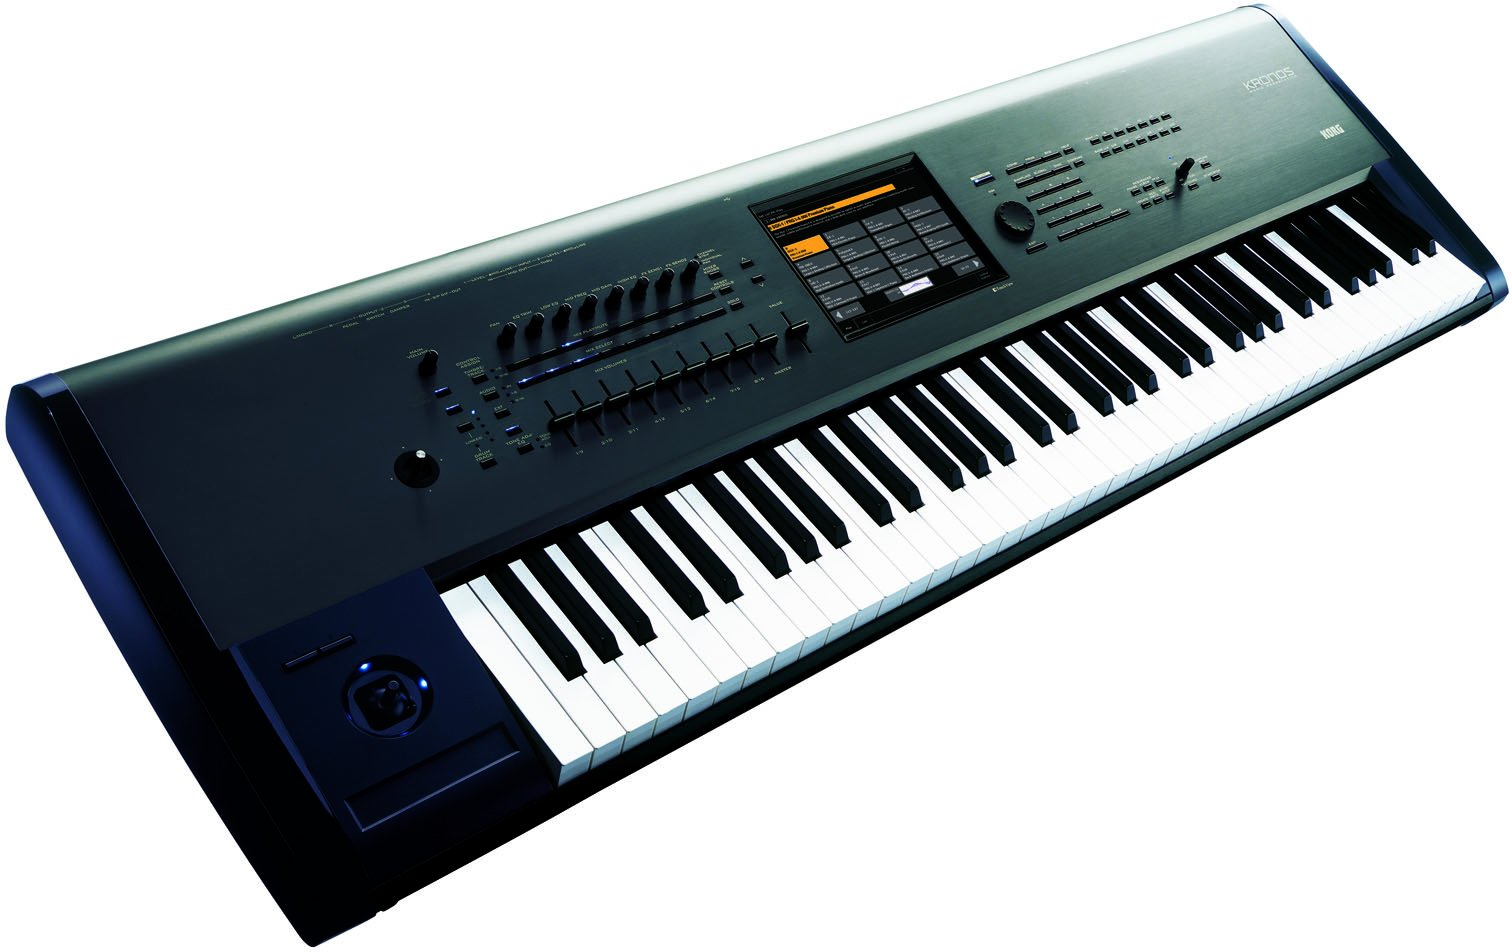 Oasys Keyboard Workstation : nine keyboards in one extensive q a gallery for korg on kronos son of oasys cdm ~ Vivirlamusica.com Haus und Dekorationen